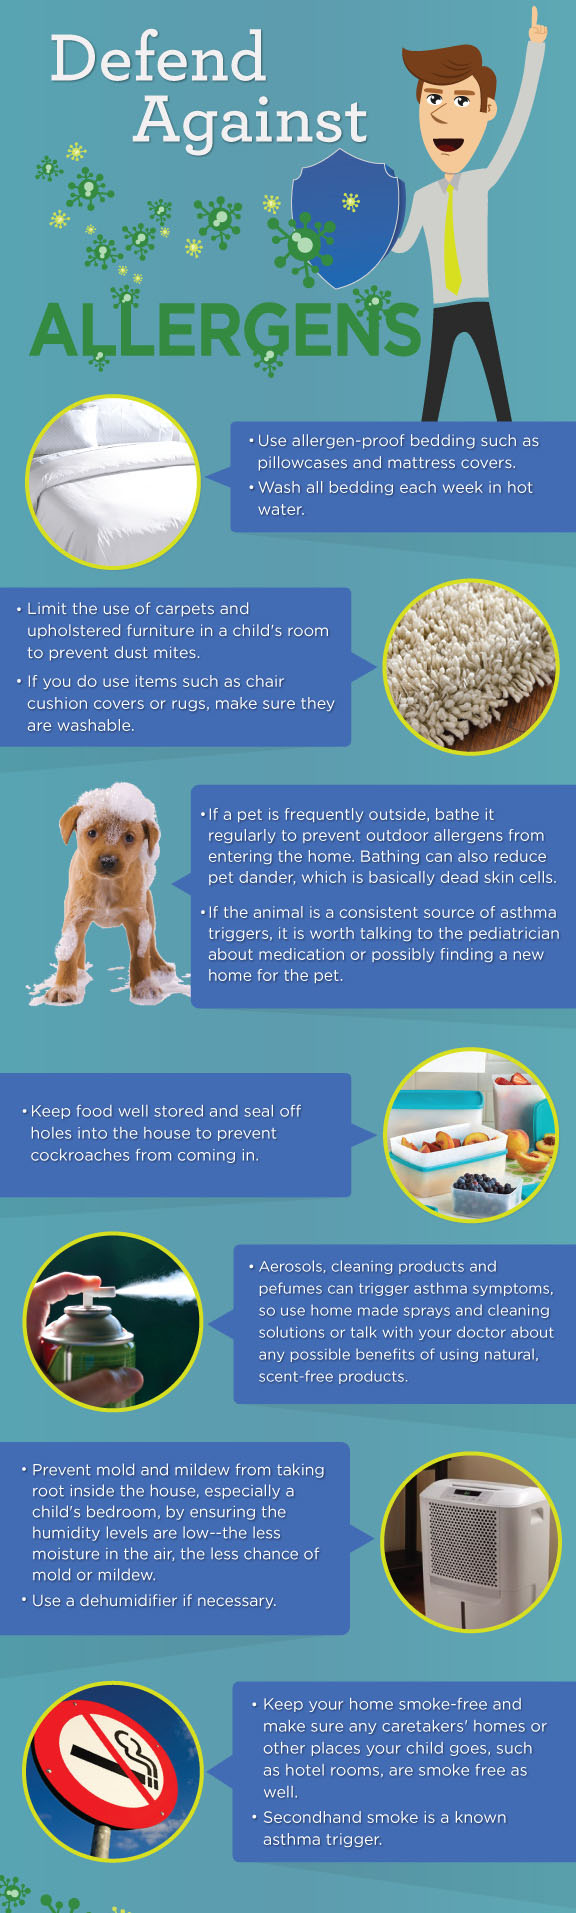 defend-against-allergens-infographic